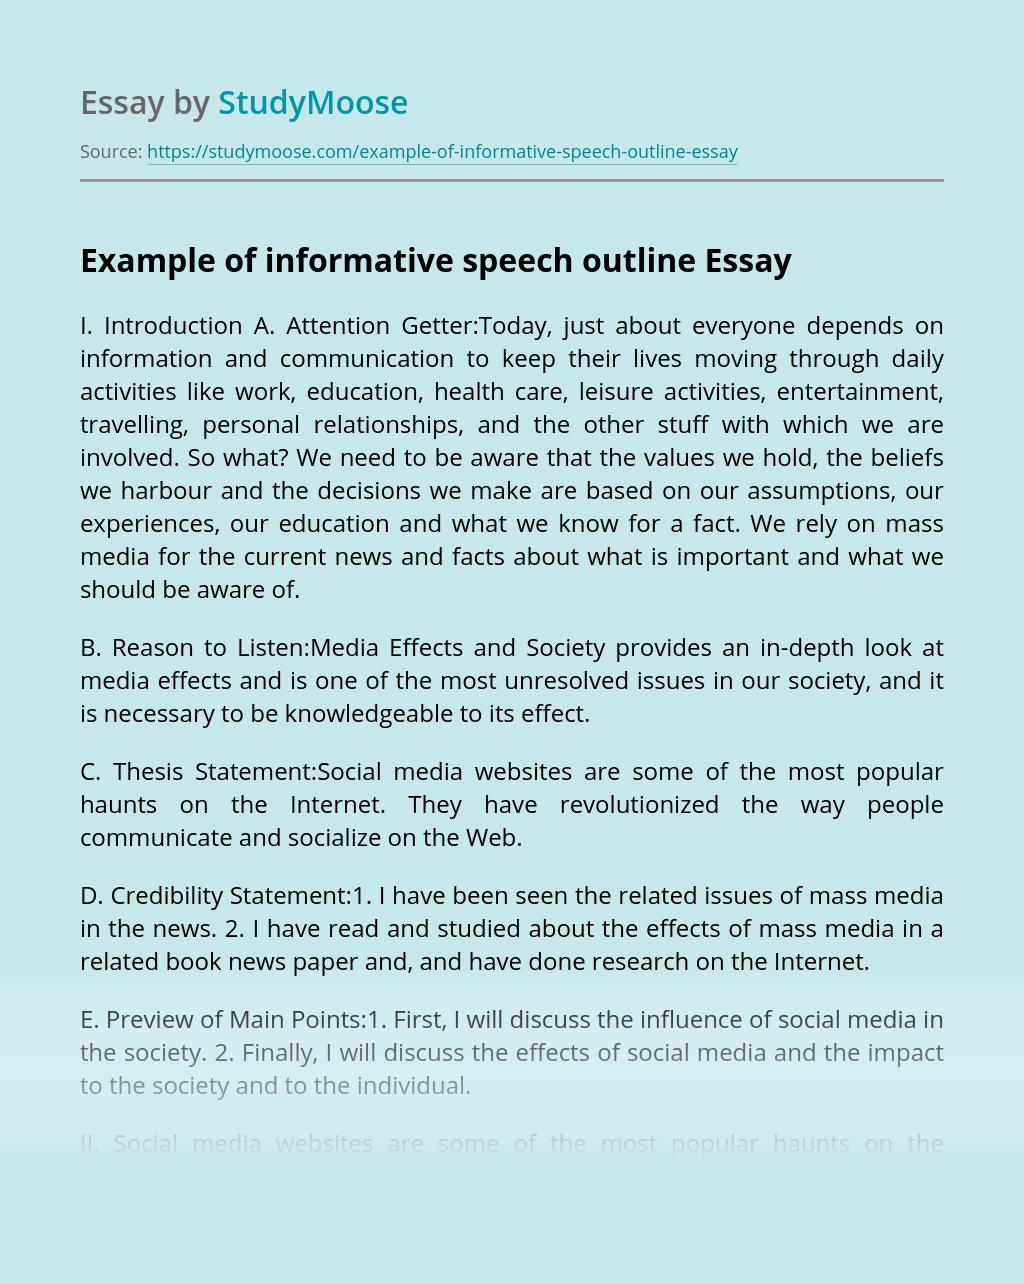 Example of informative speech outline